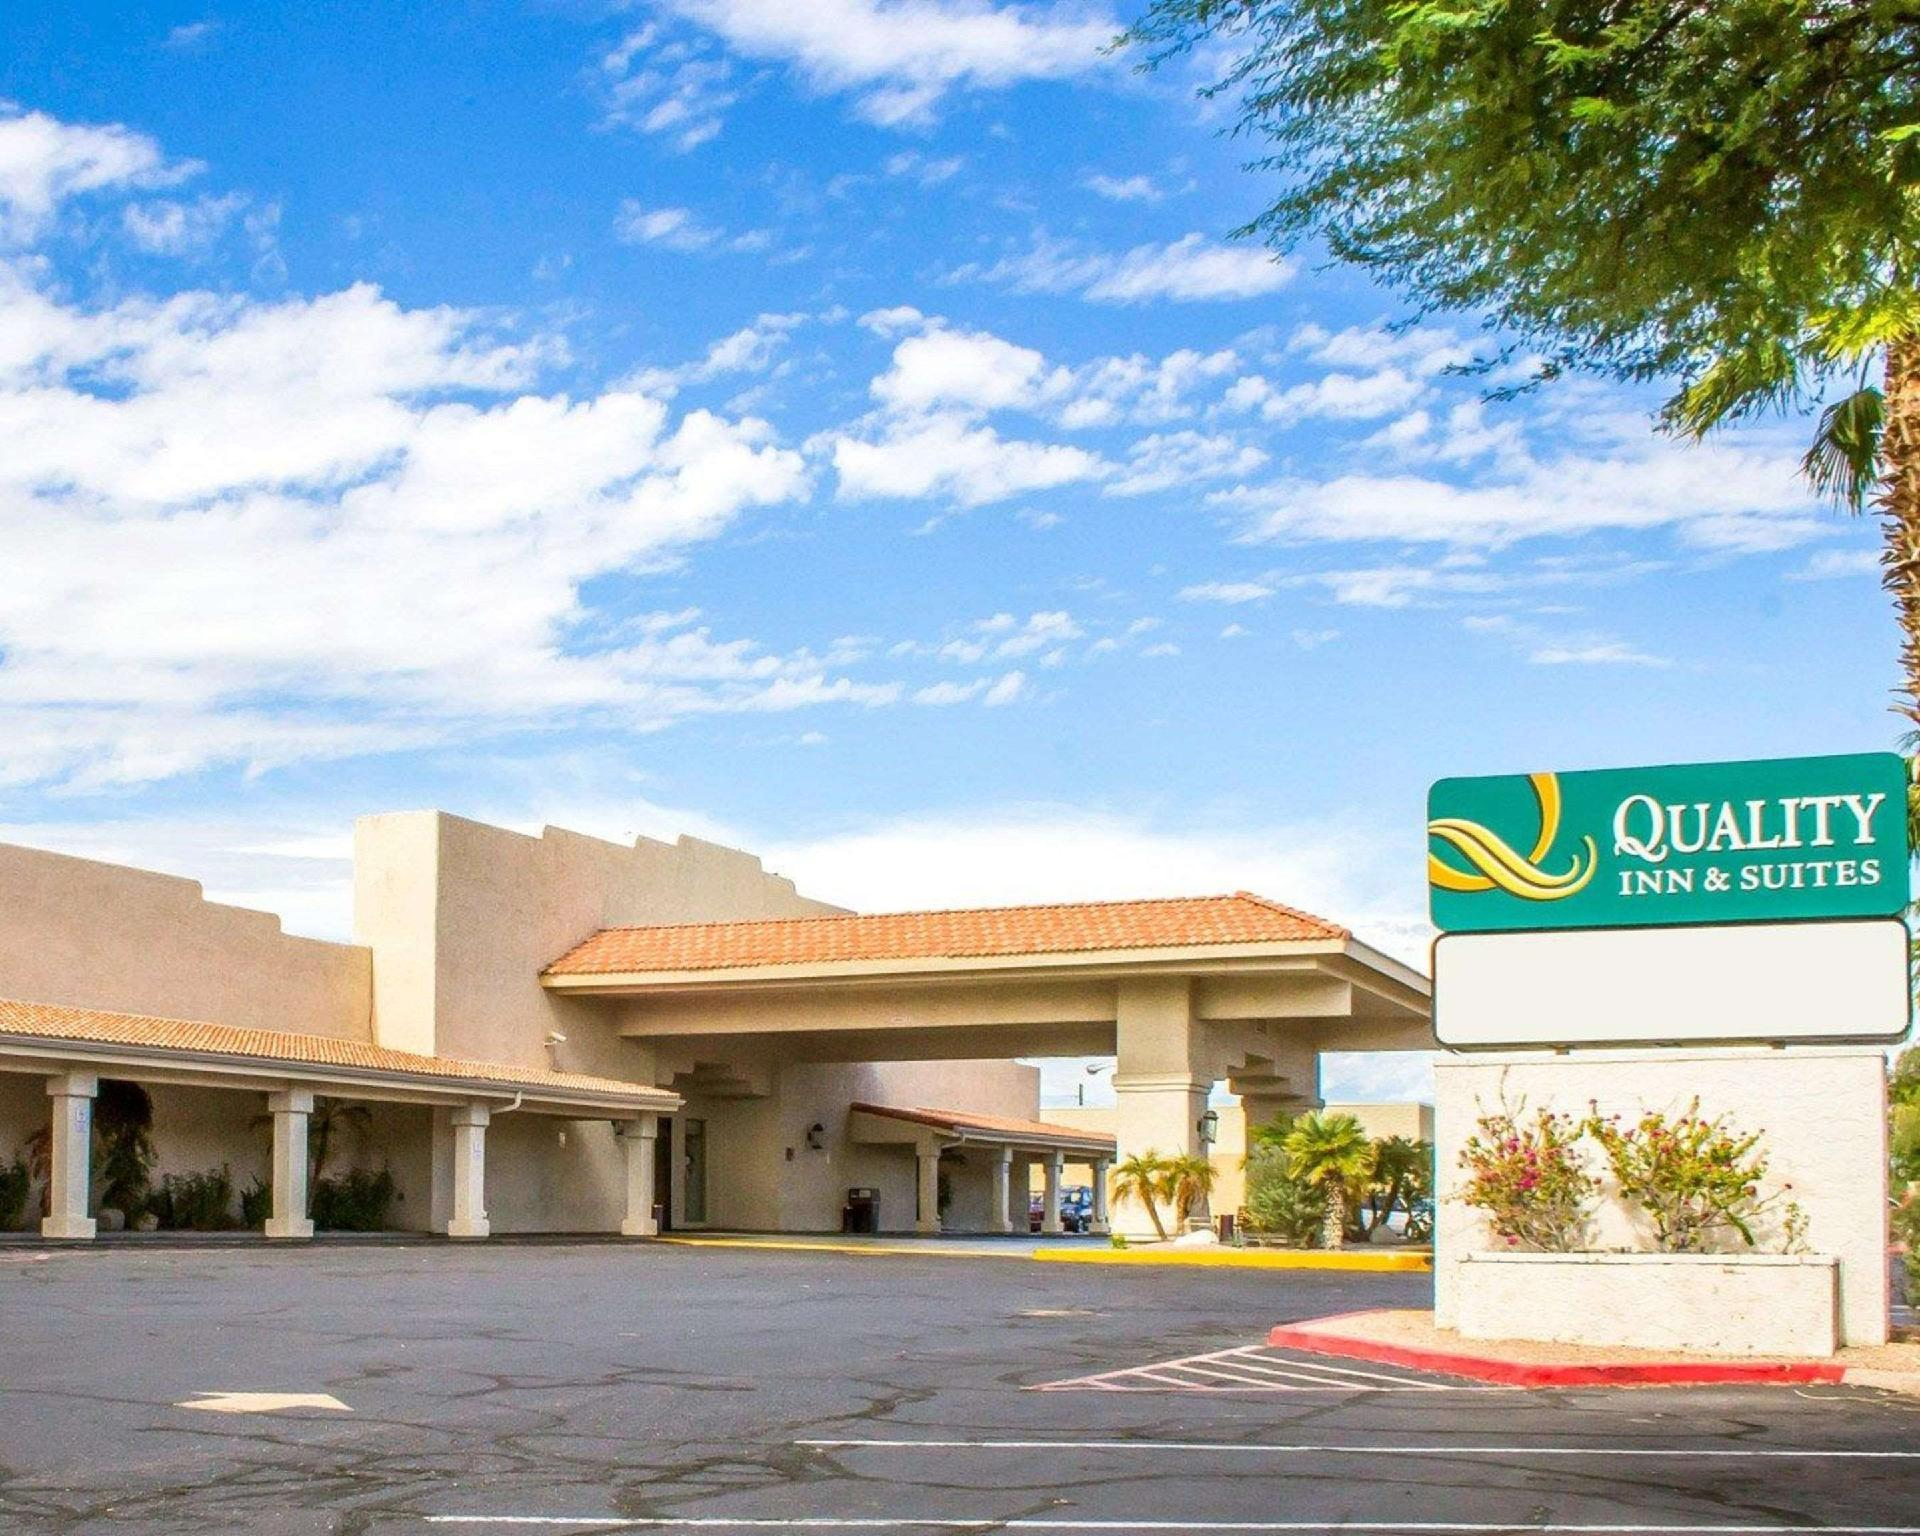 Quality Inn And Suites Lake Havasu City